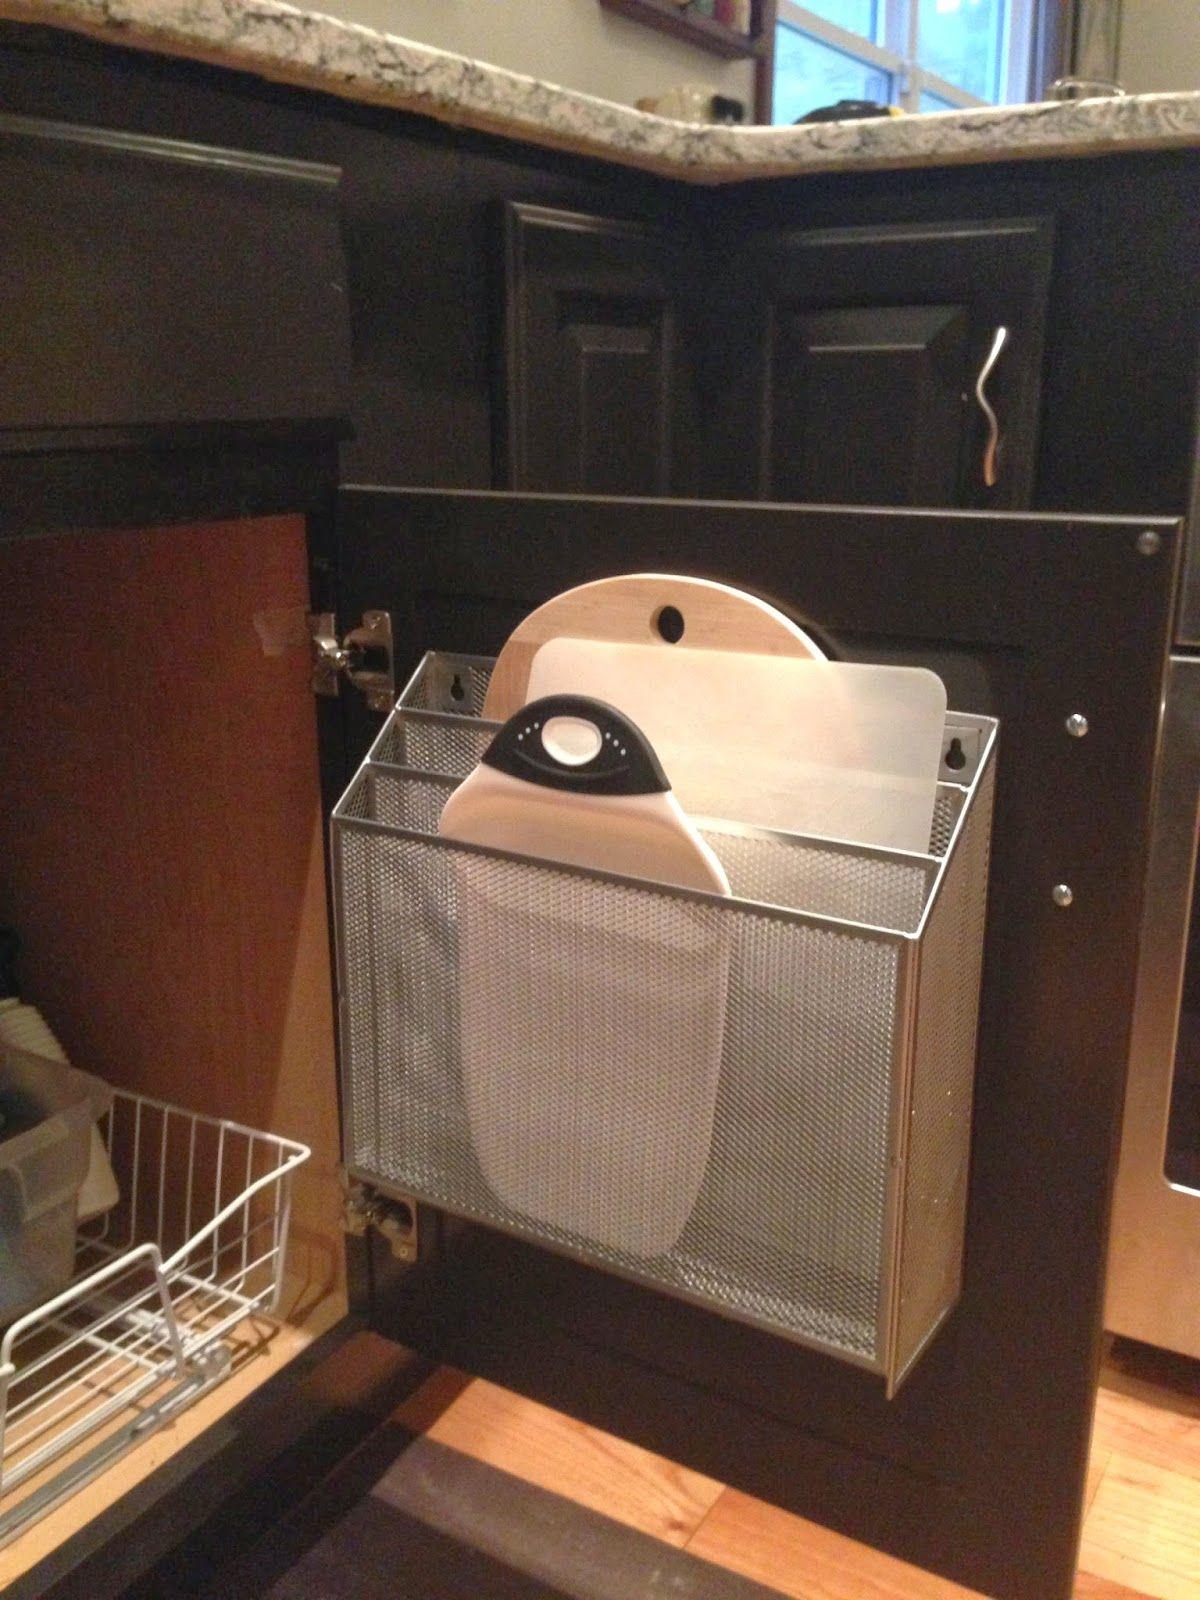 File Organizer Used as Kitchen/Cutting Board Storage | DIY Kitchen ...